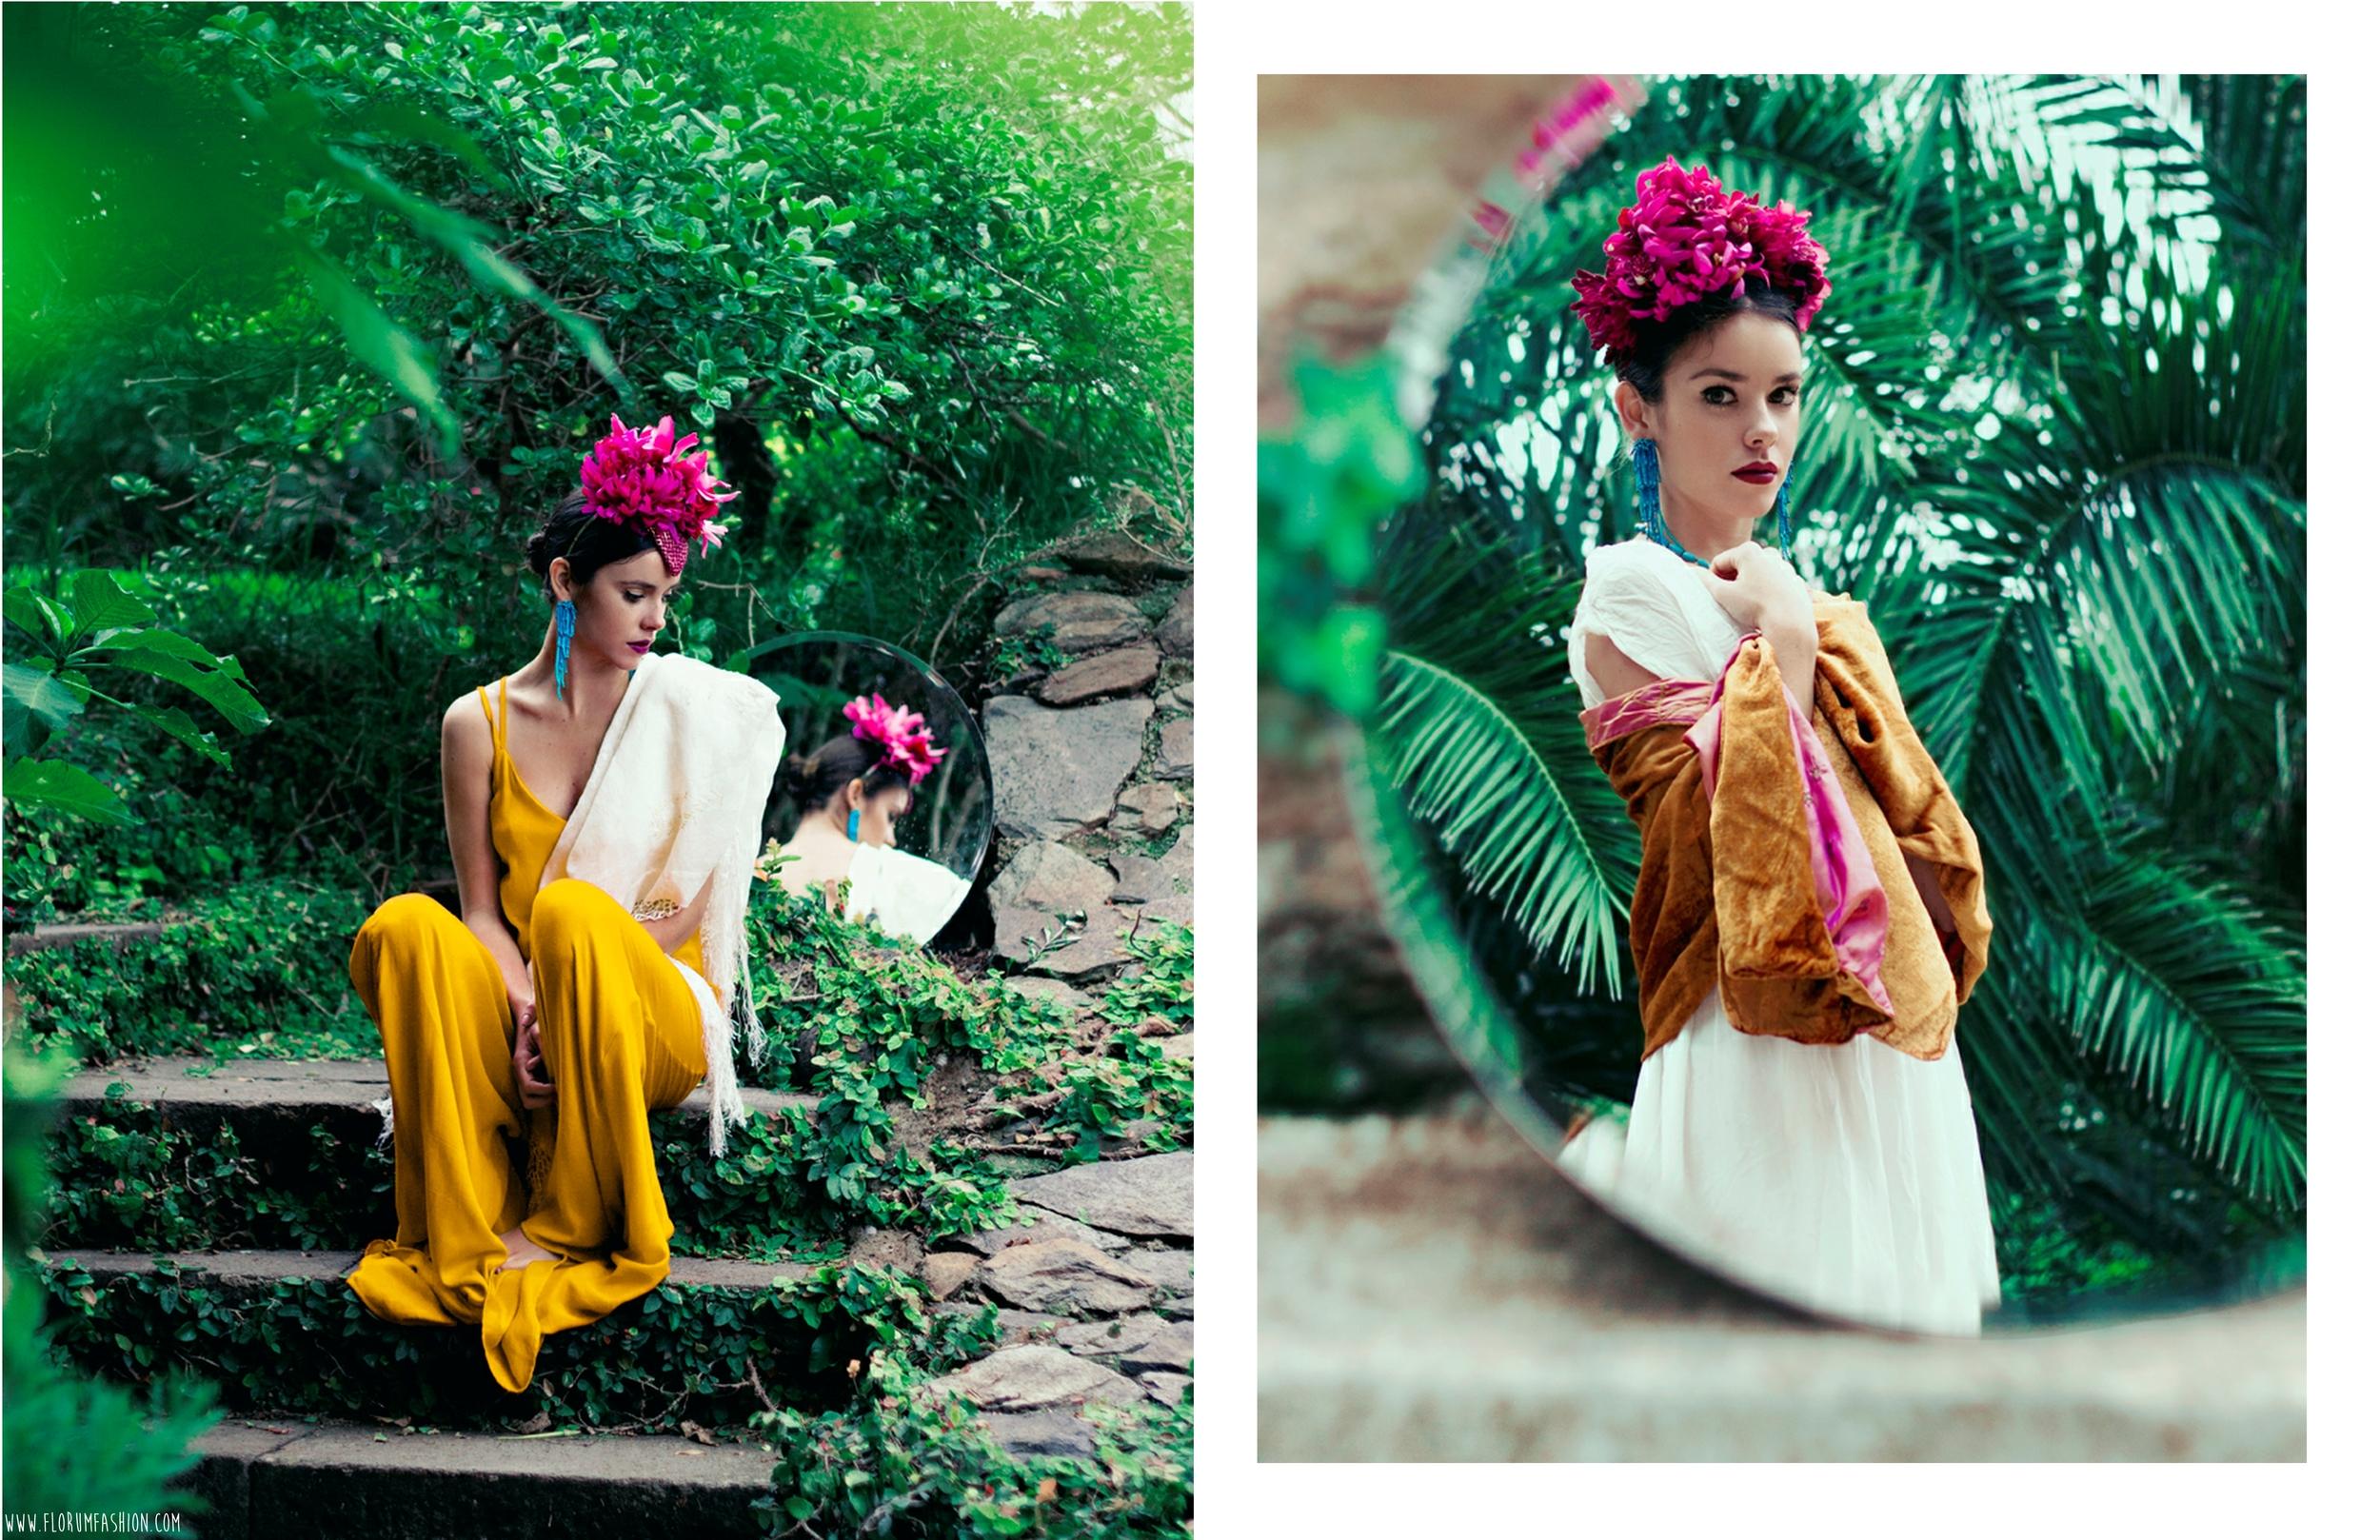 Topeka Headwear - Joaquin Burgueño - Ballerina Sofia Rubio Robles - Carlota Cabrera Ballesteros - Florum Magazine - Fashion Revolution - Slow Movement - Ethical -Sustainable - Canary Islands Spain